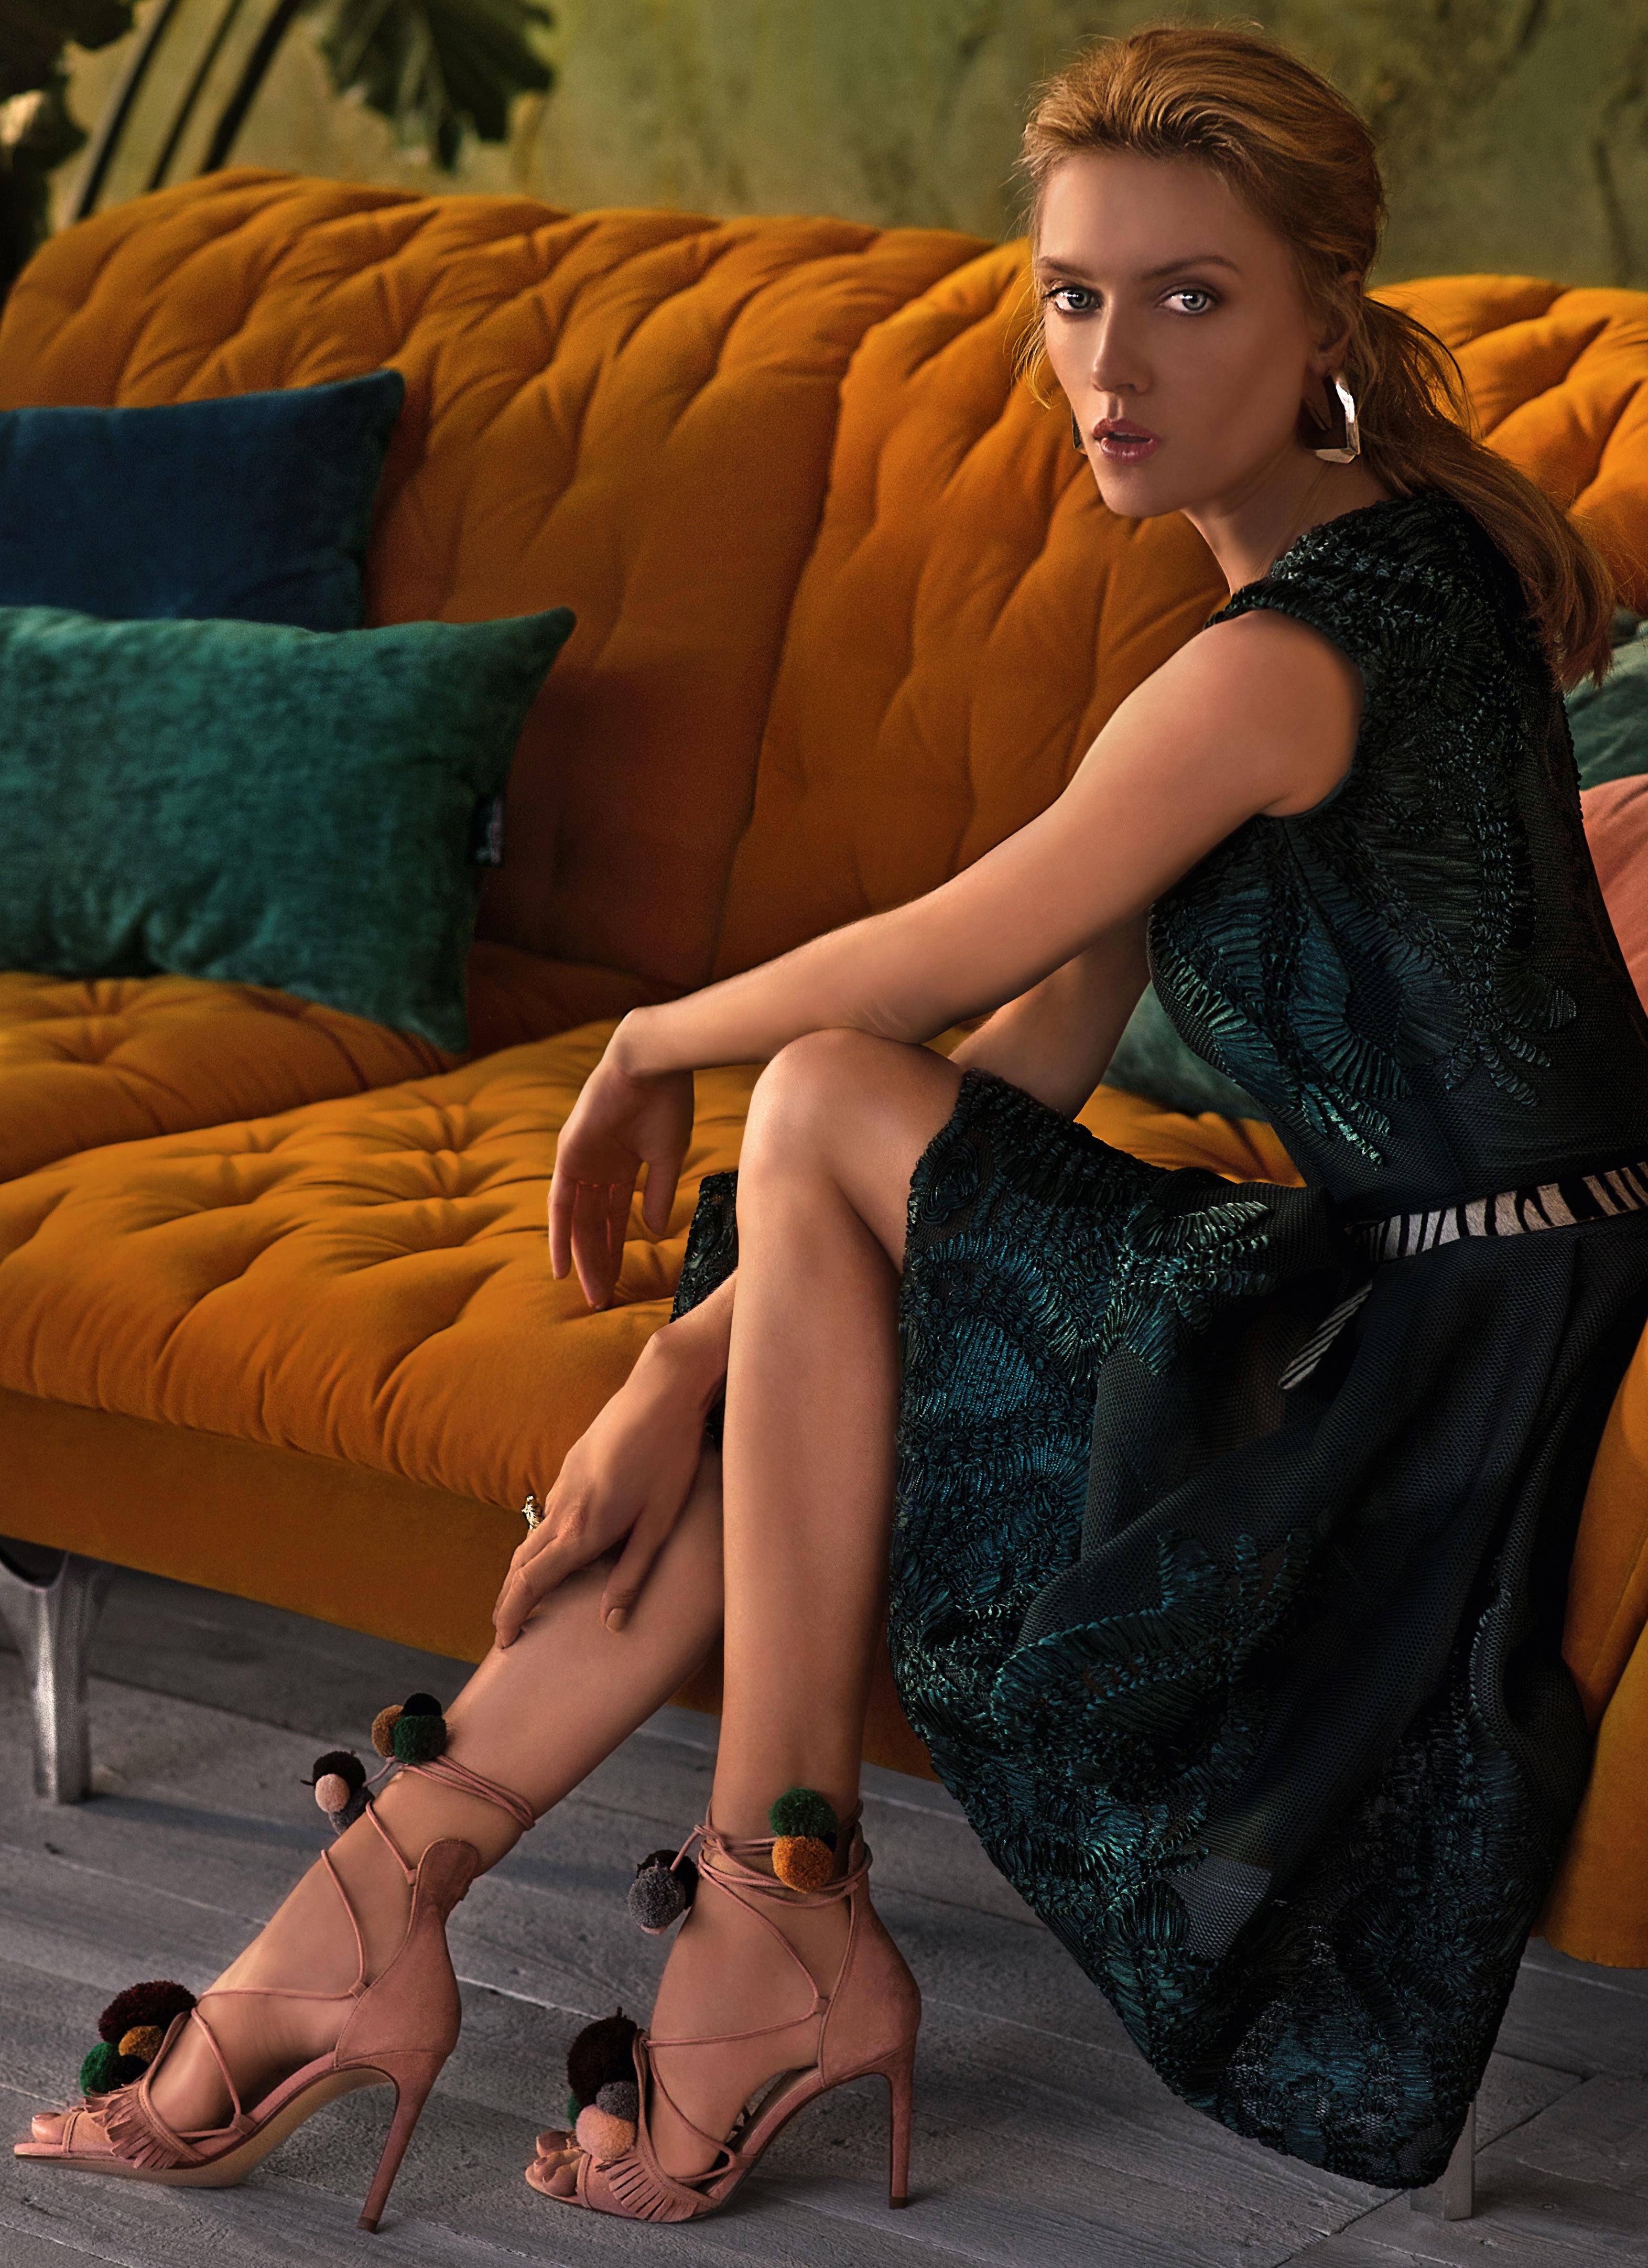 Feet AnastFeetija Makarenko nude photos 2019